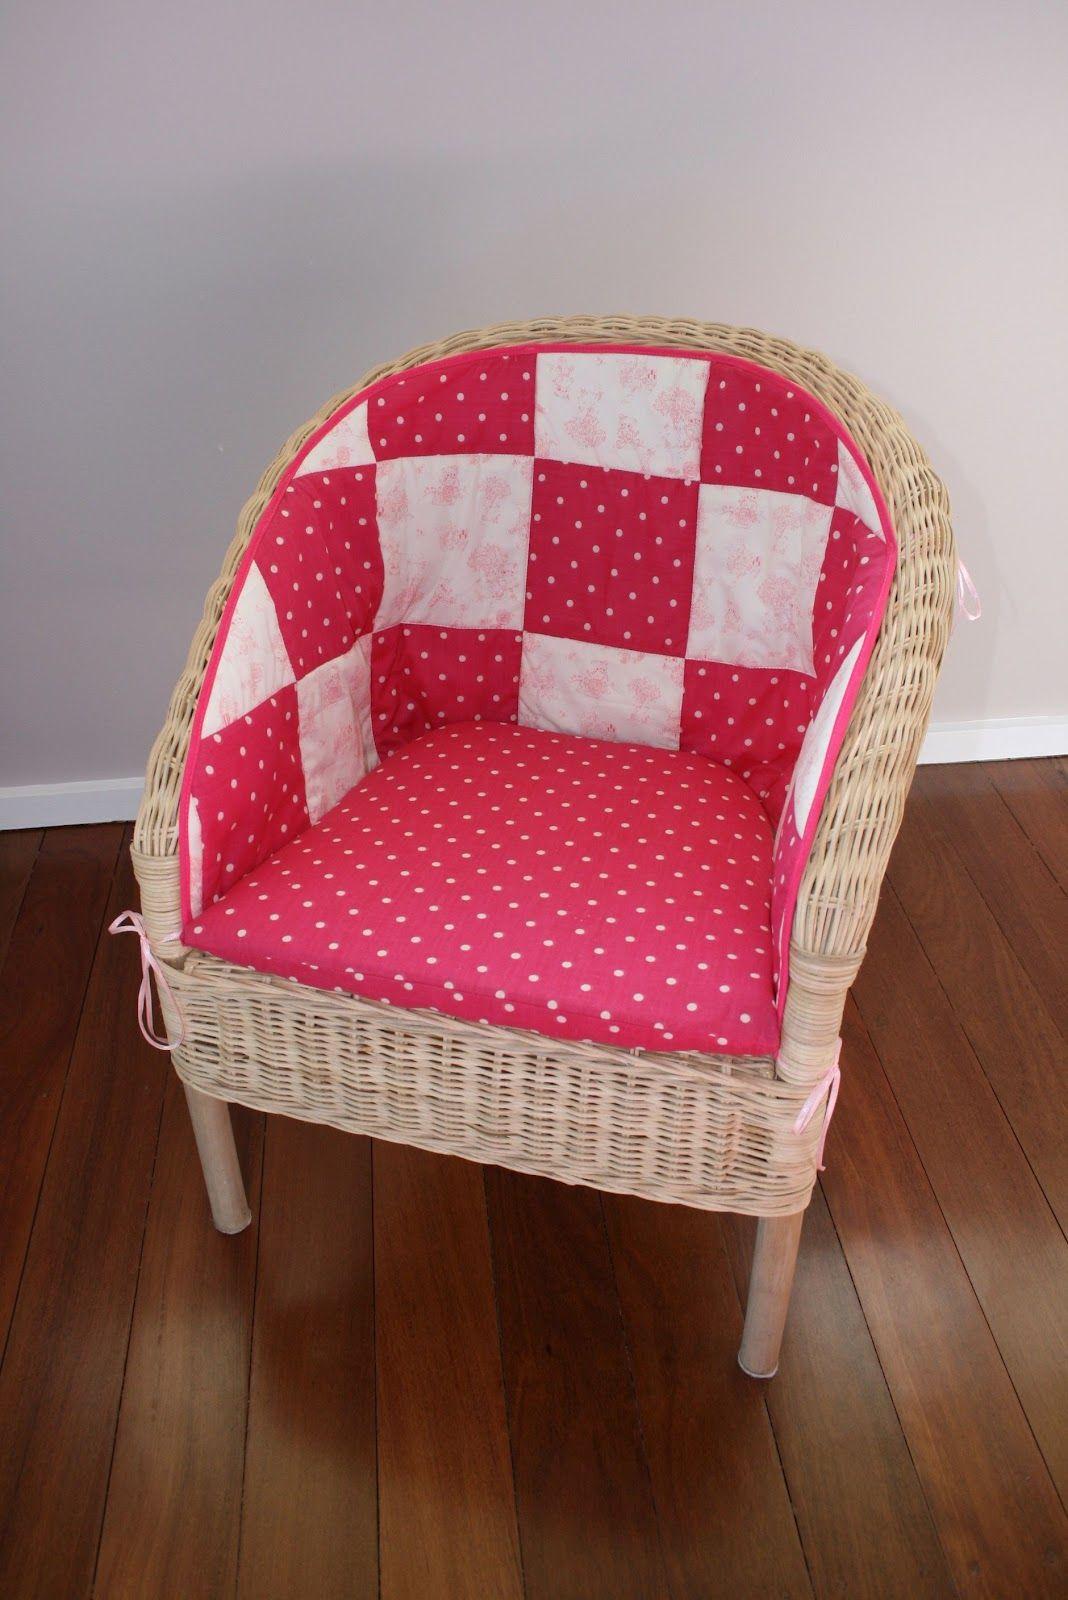 Liese & Alyssa Ikea AGEN Children's Armchair Cover